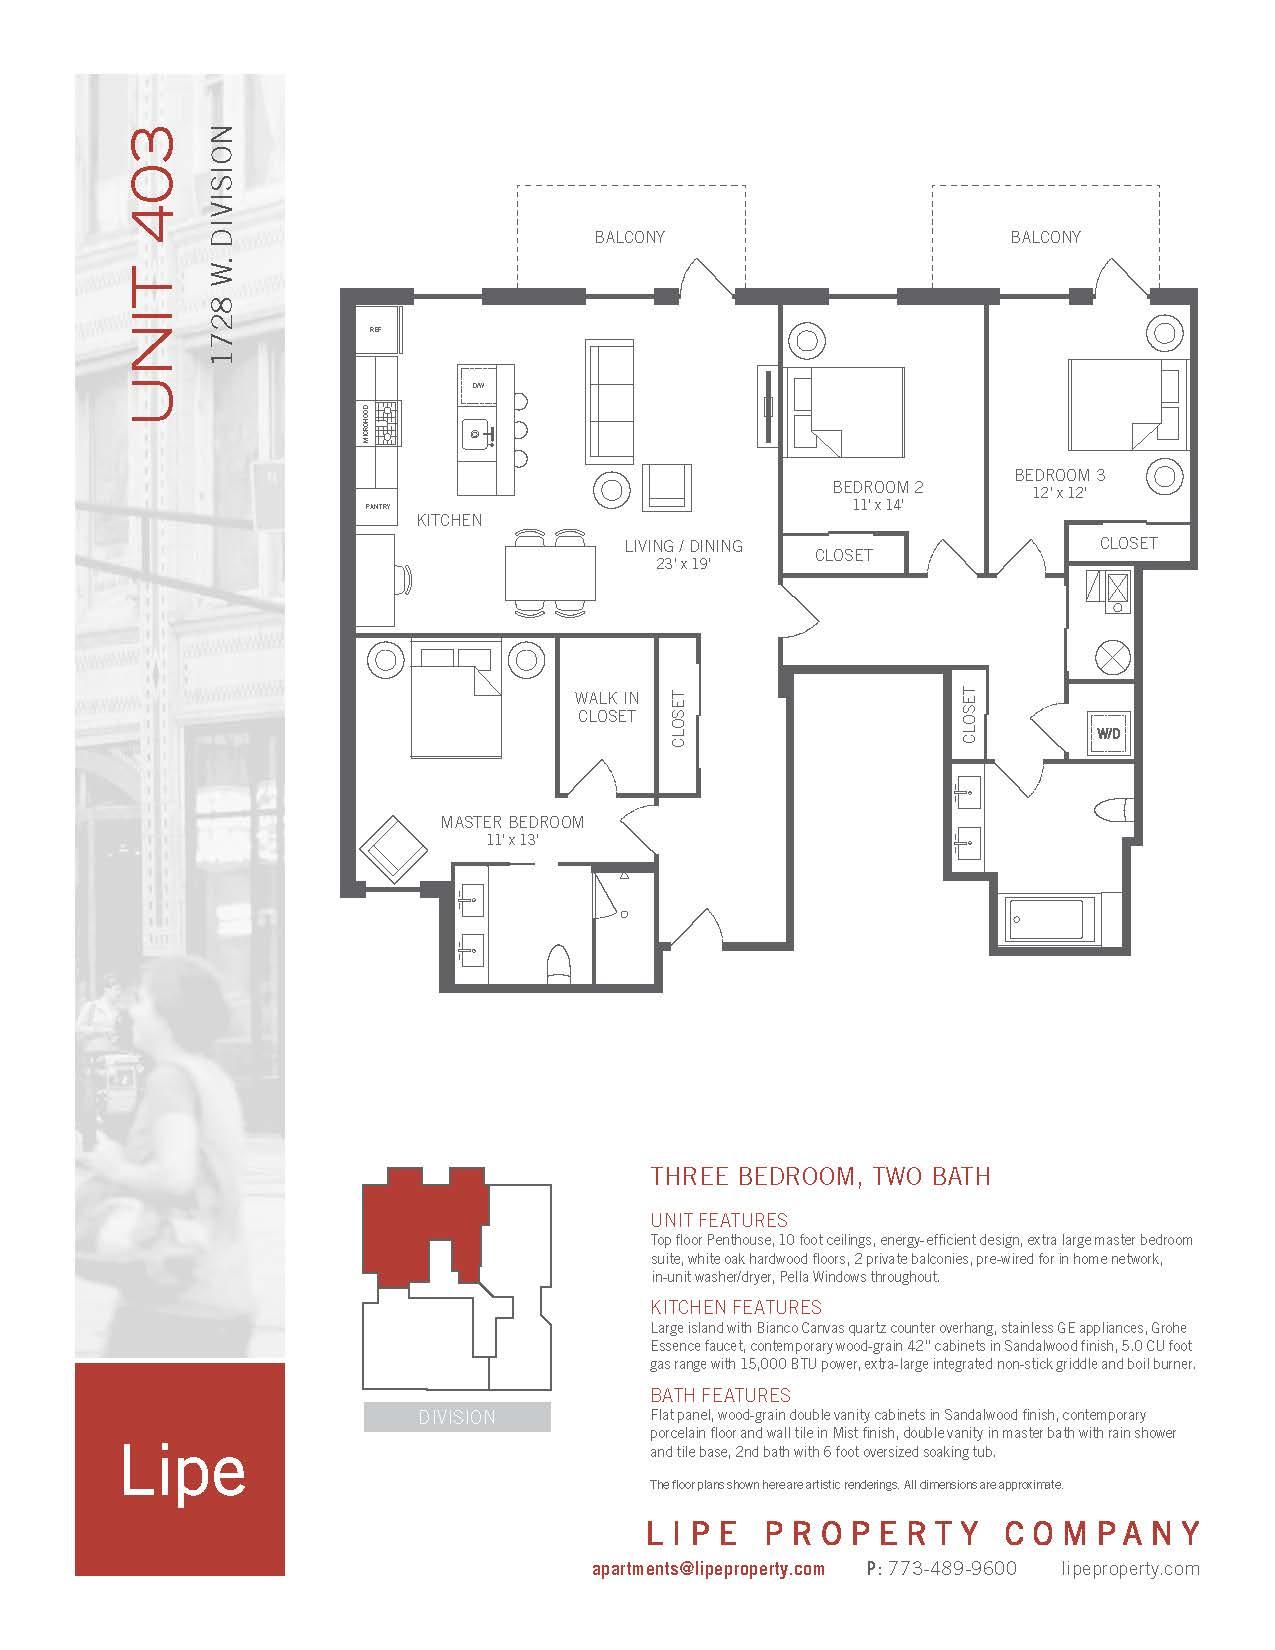 1728-West-Division-403-floorplan-Chicago-apartment-for-rent.jpg